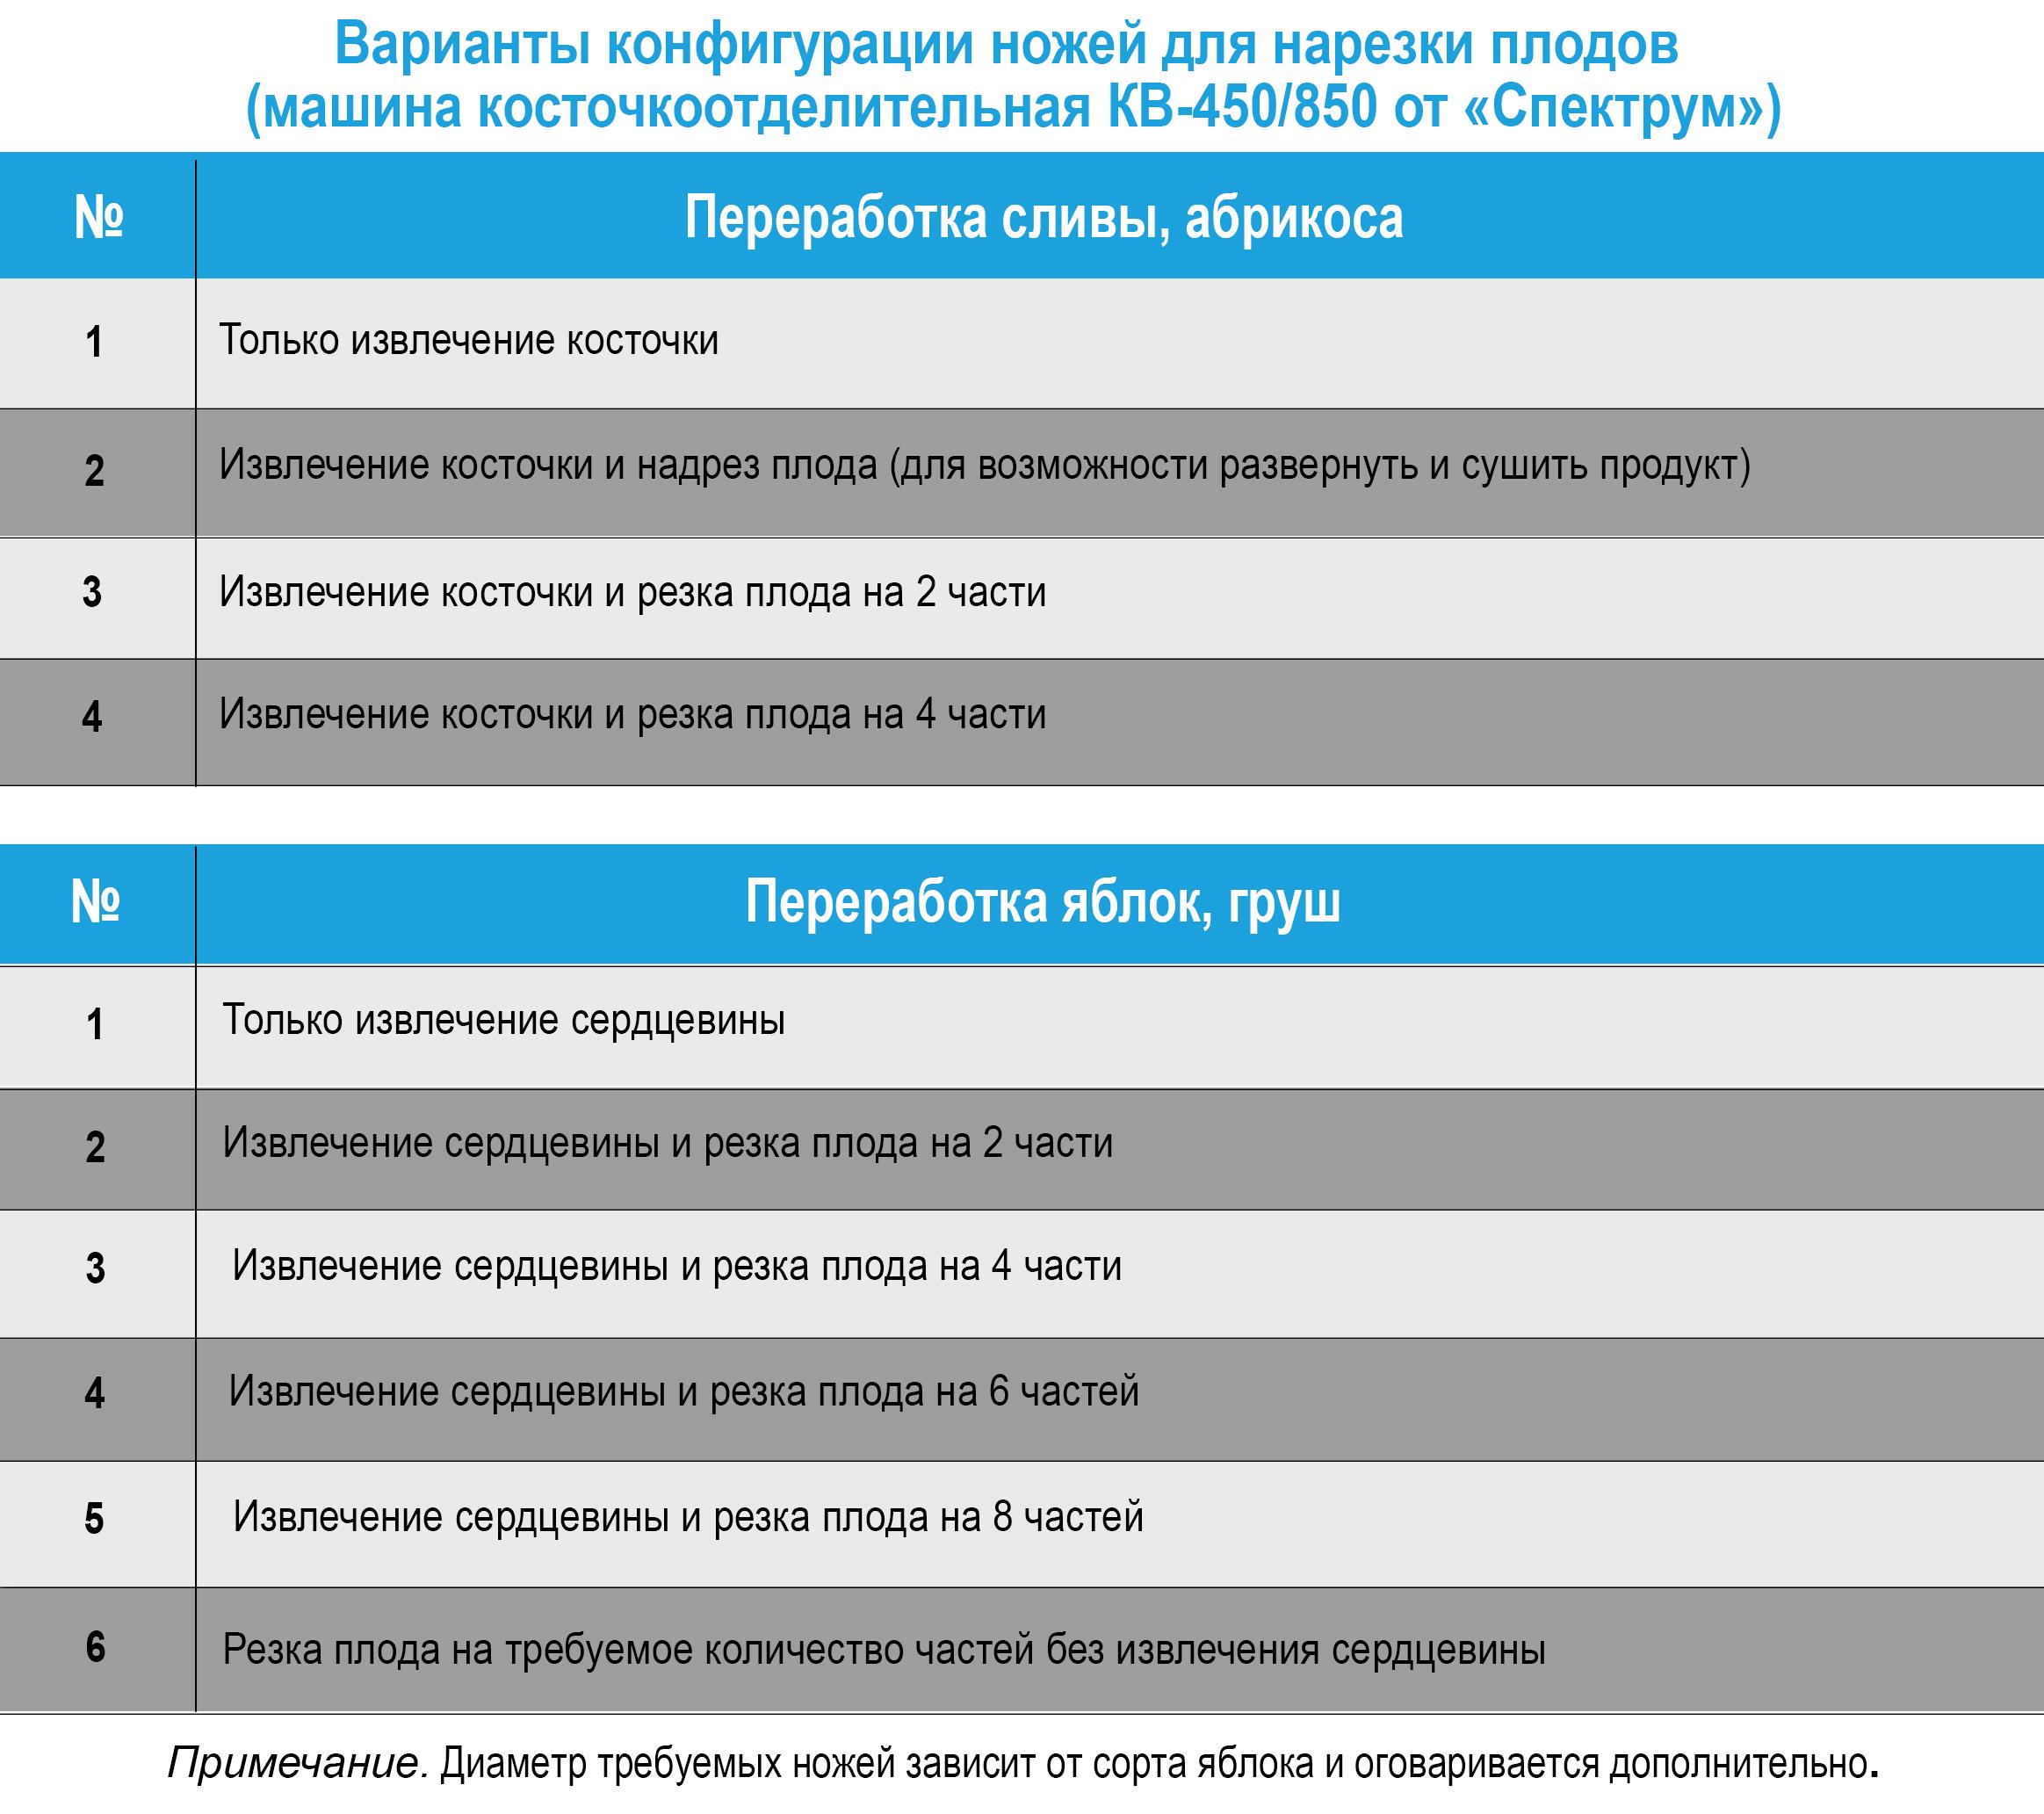 Varianty komplektazii nozhami KV-450 i KV-850 ot Spektrum